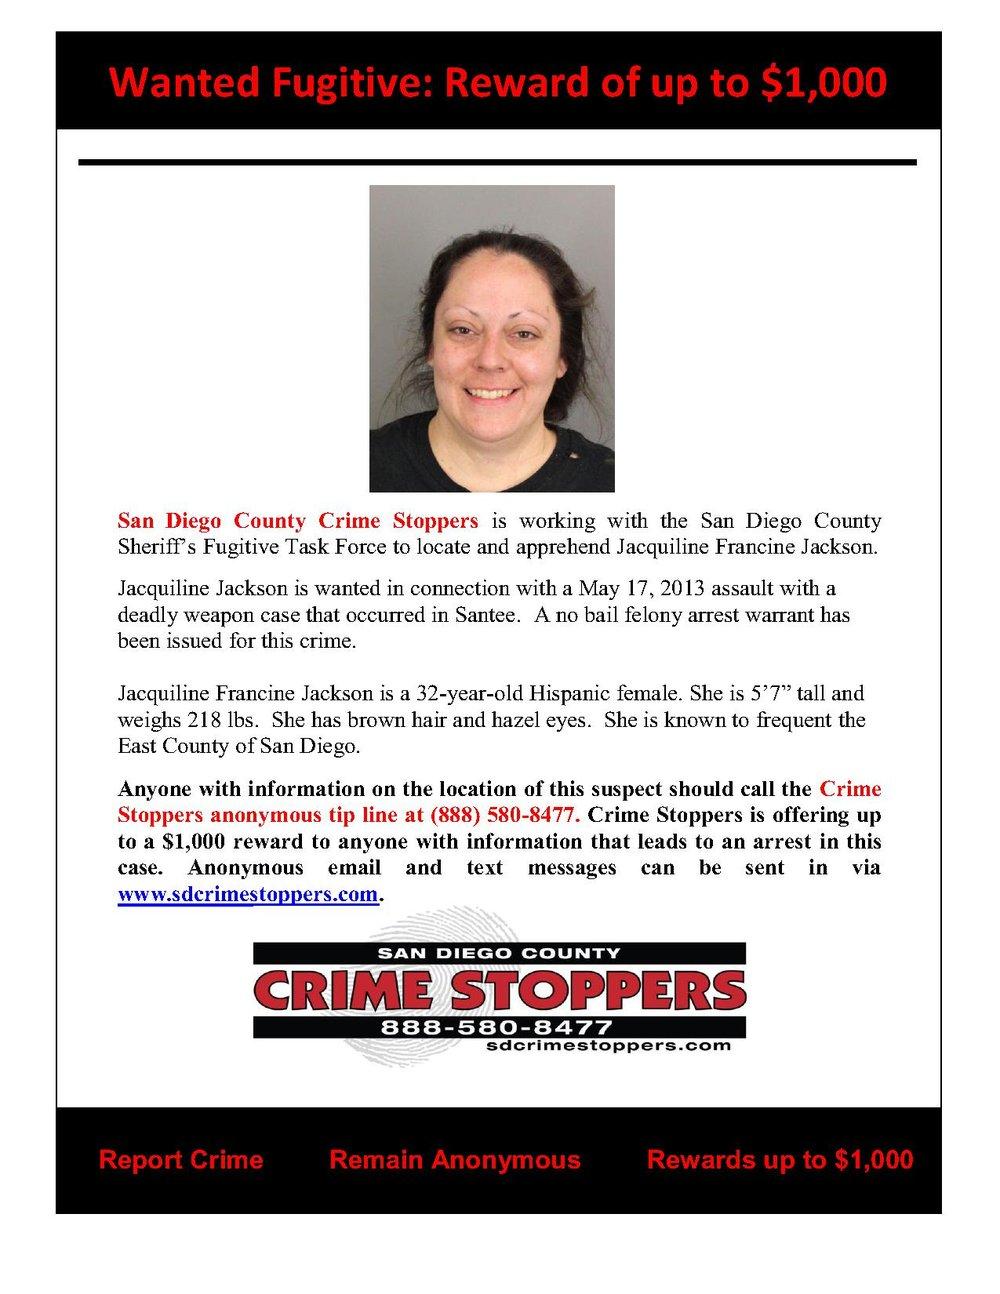 072814 Fugitive Jacquiline Francine Jackson_1